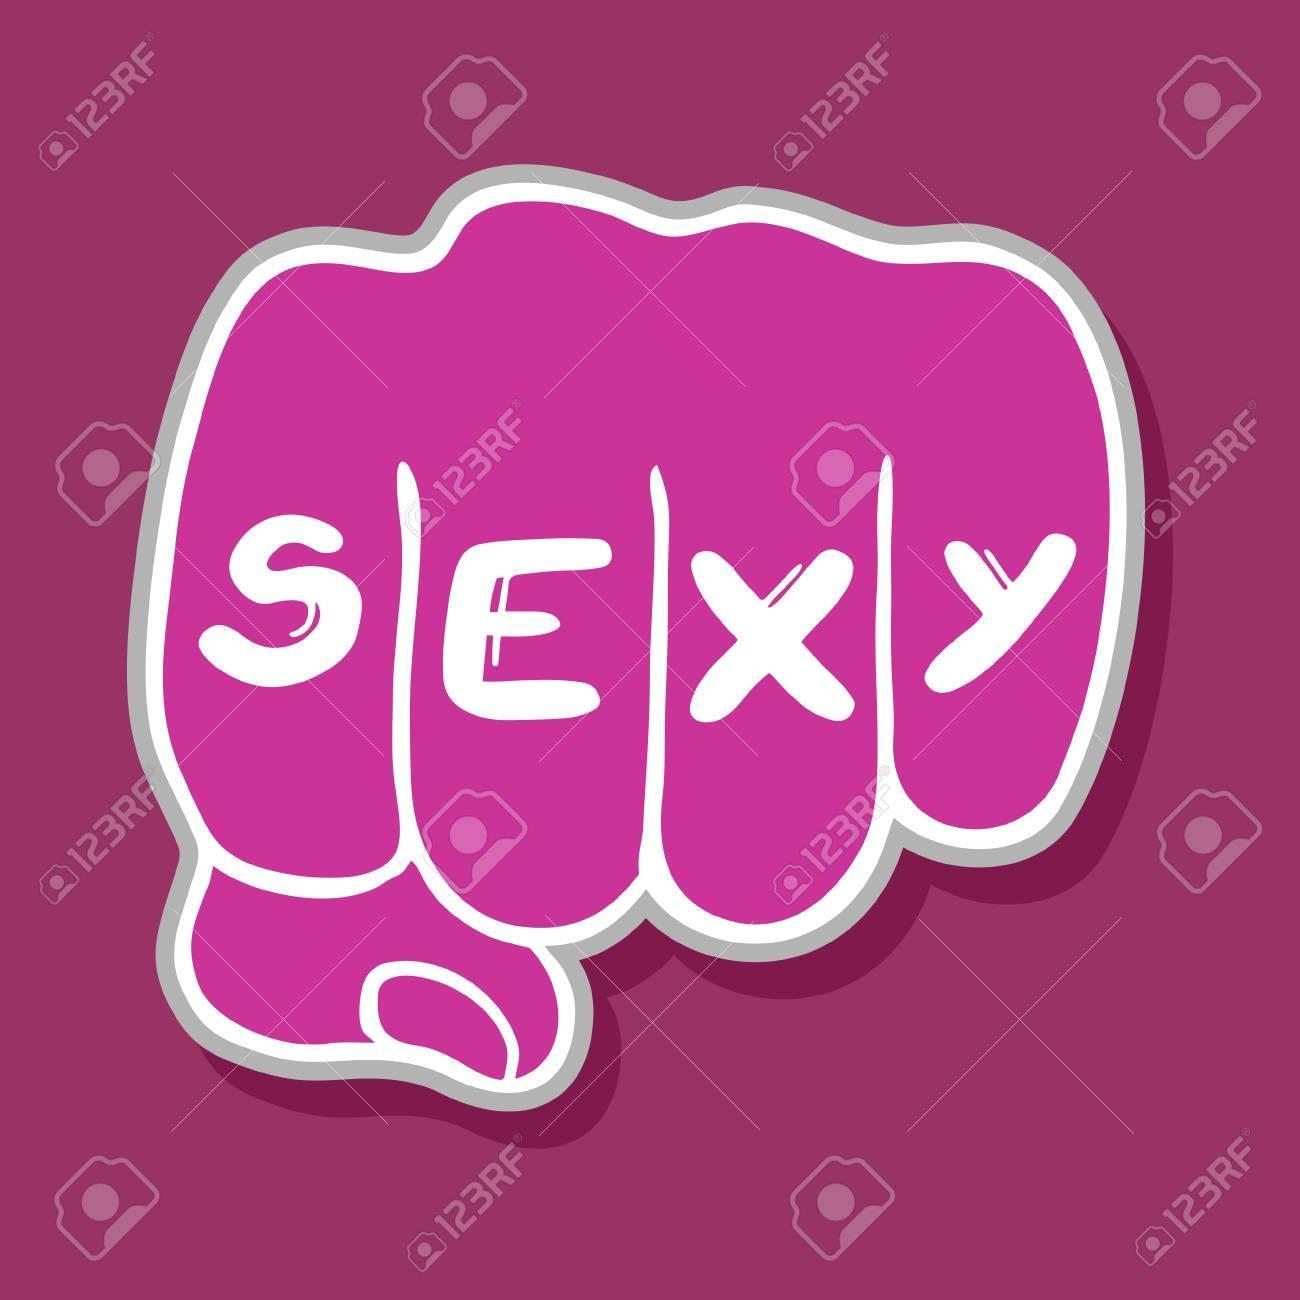 sexy message